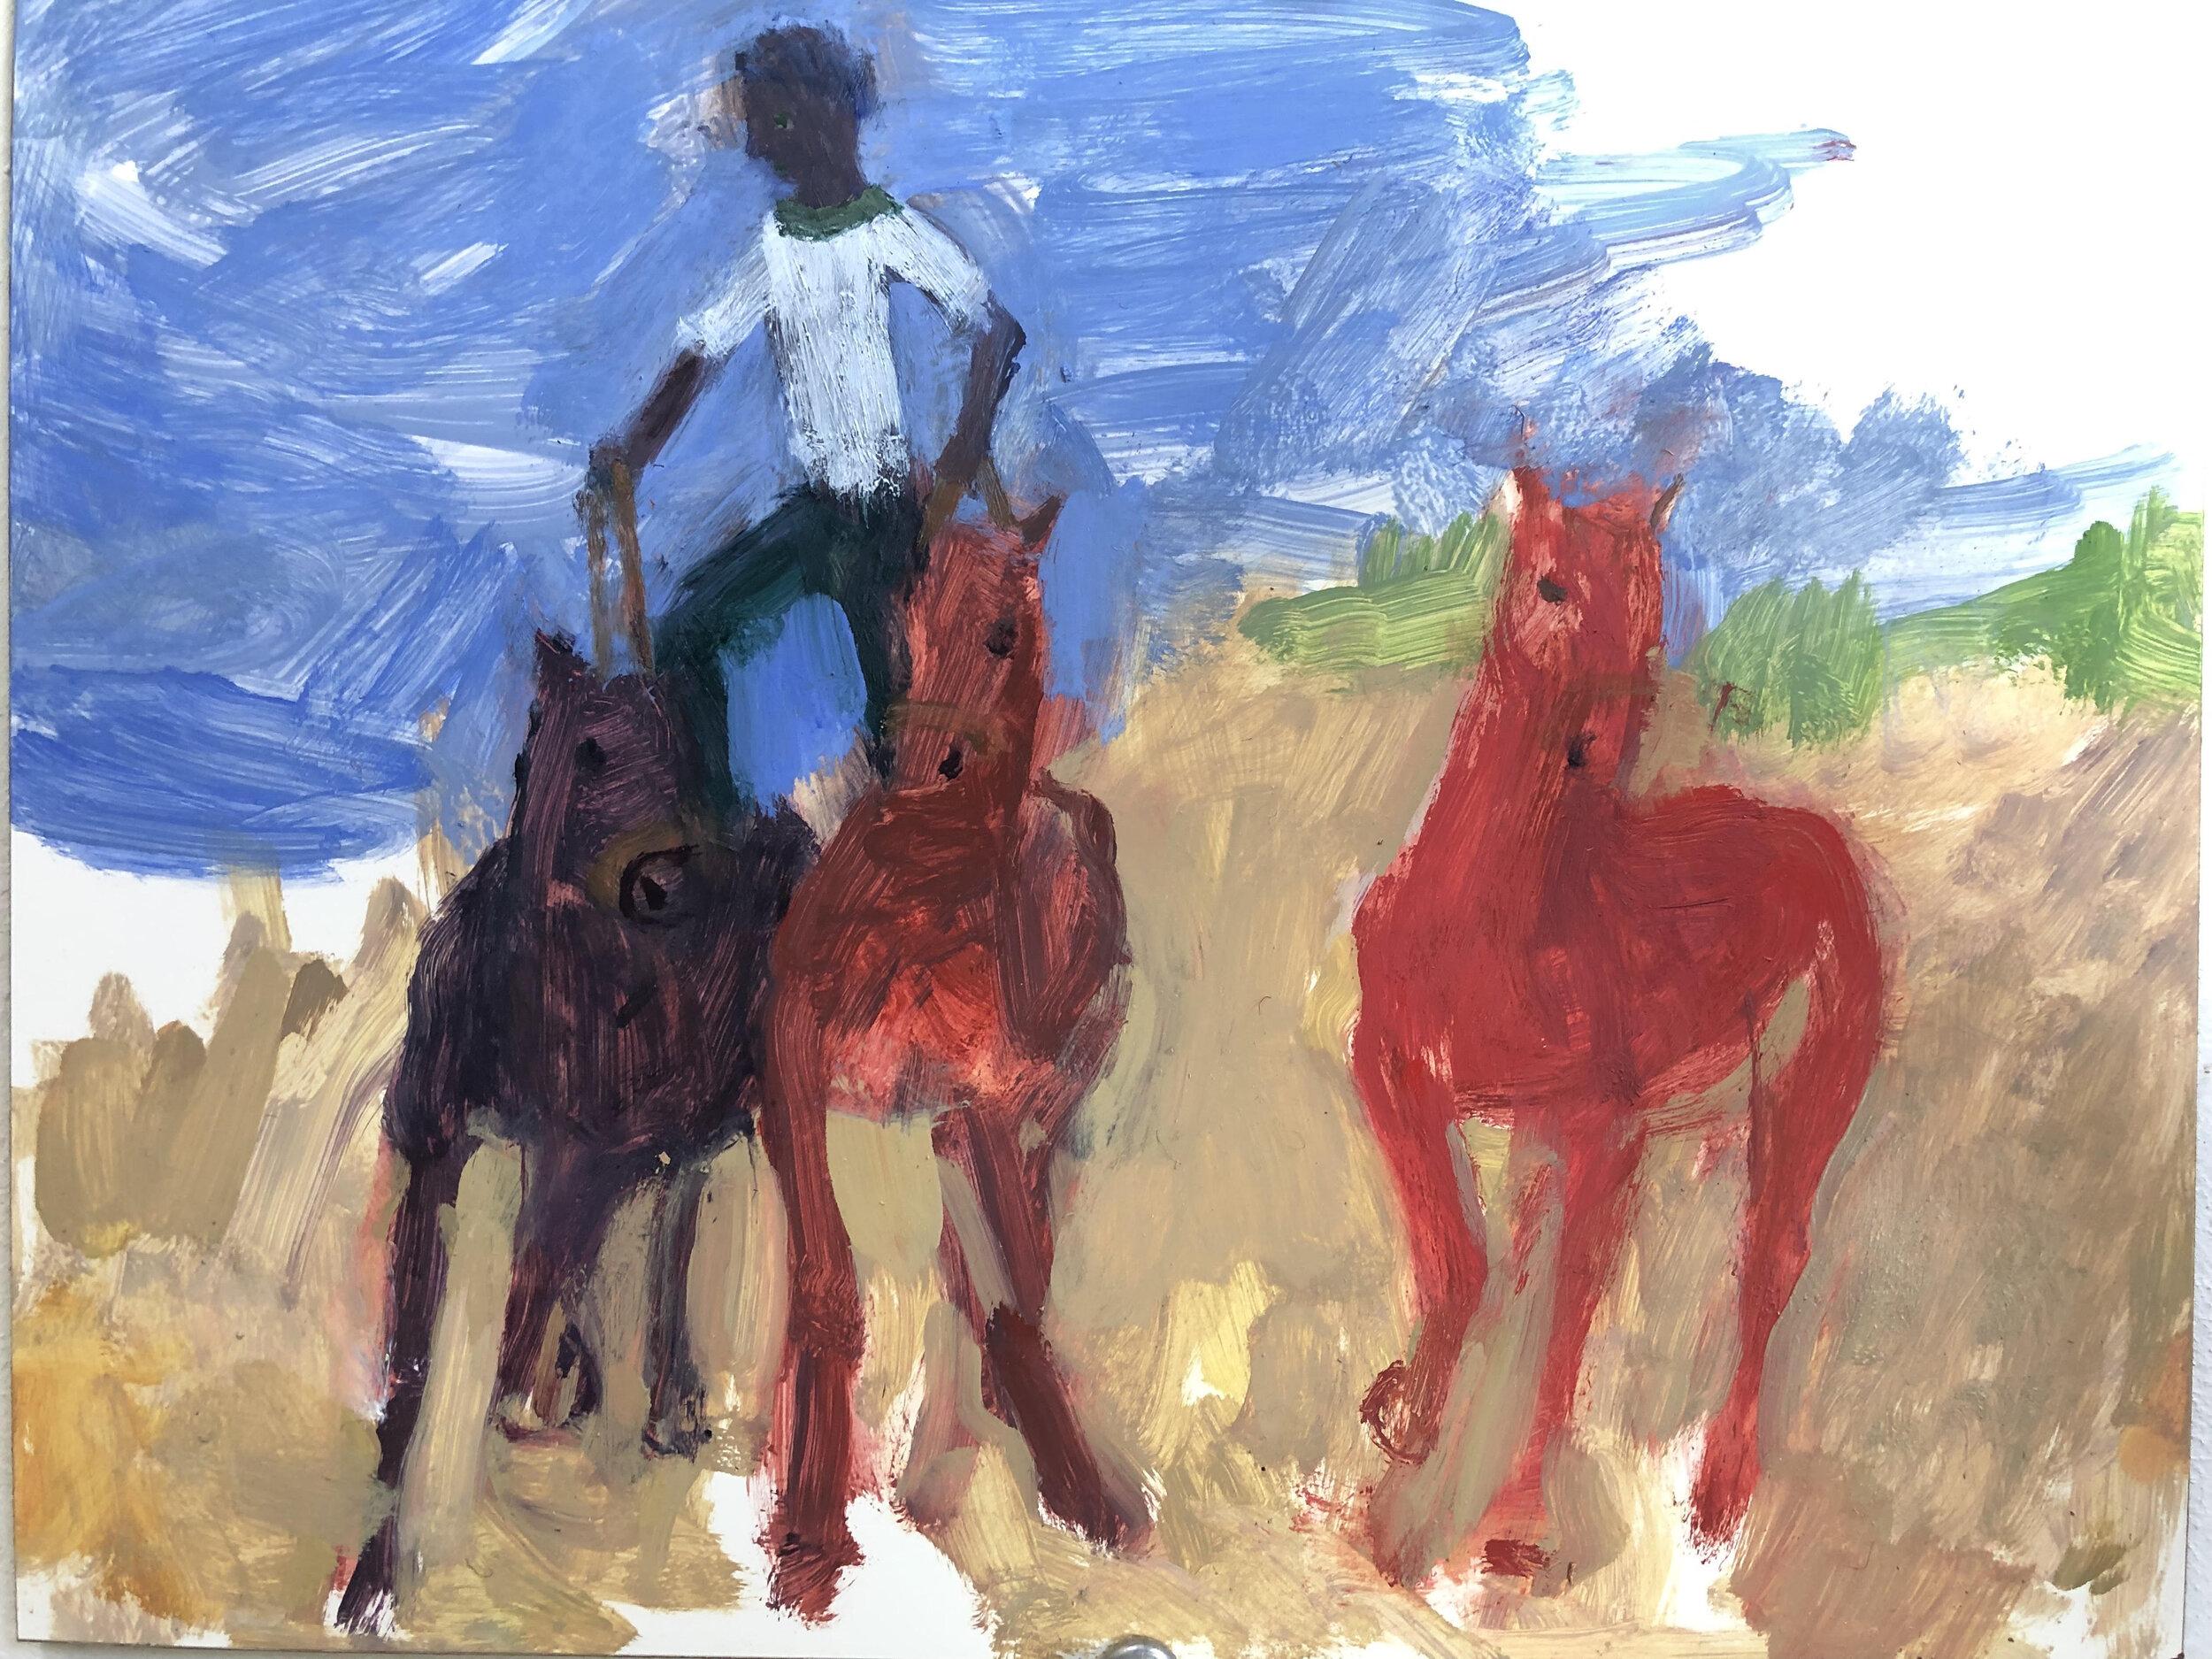 Roman Rider with Third Horse, 2019